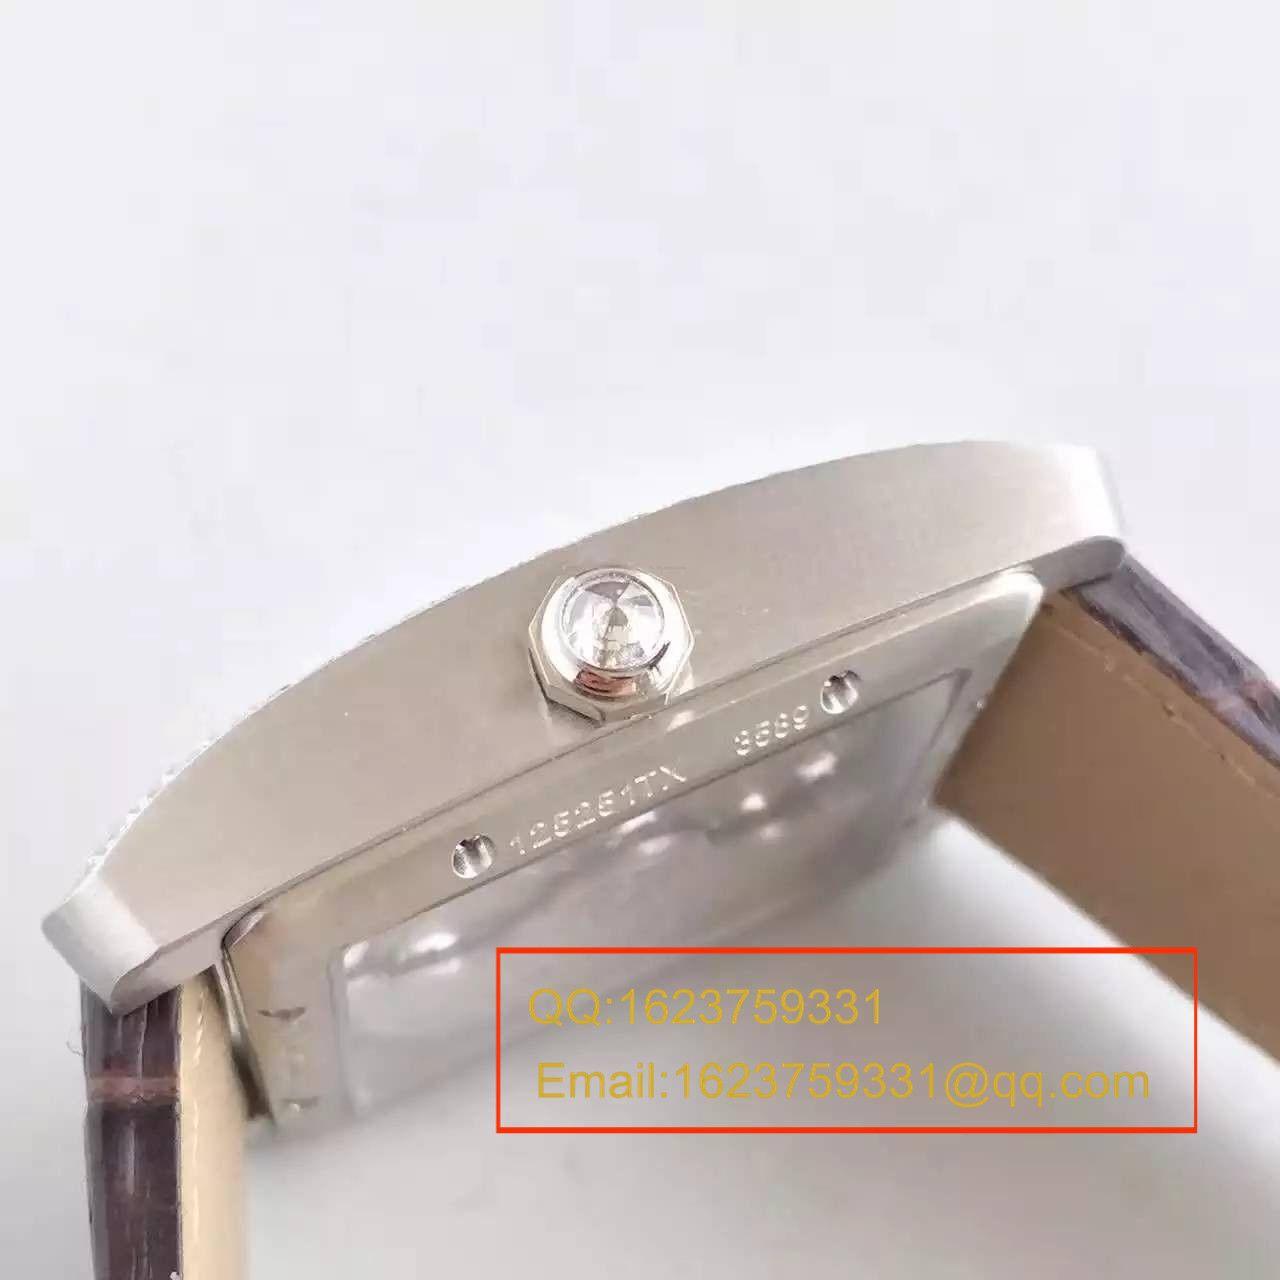 【JF厂一比一复刻手表】卡地亚坦克系列TANK MC系列 W5330003腕表 / KAG020